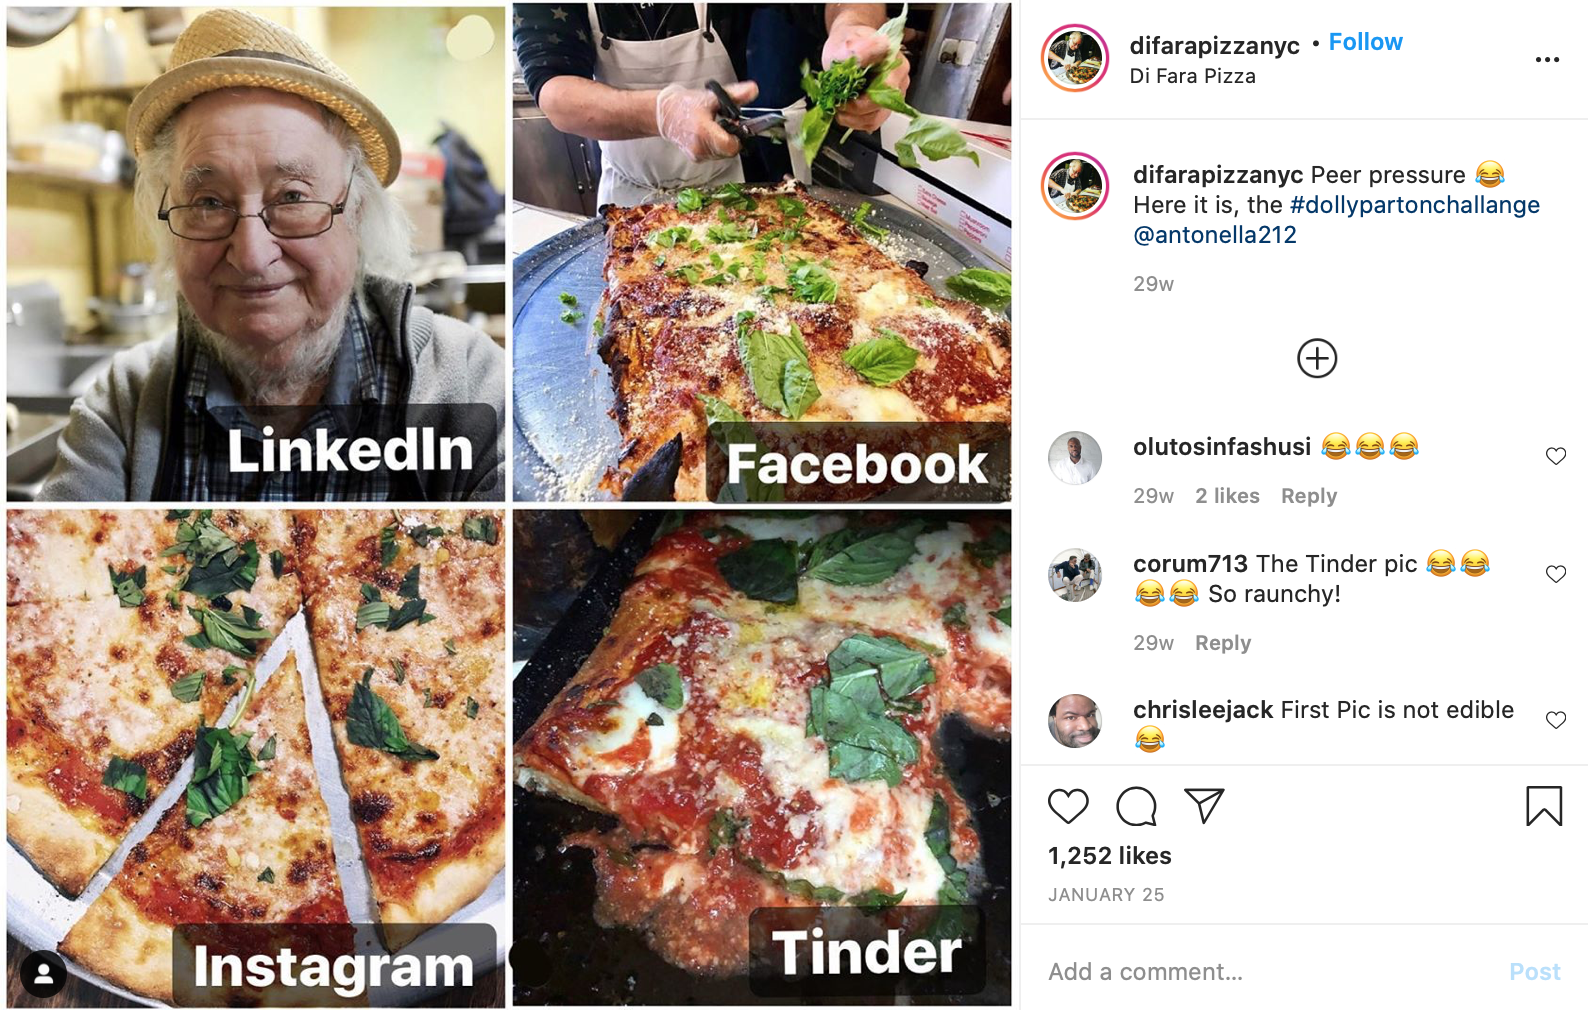 best pizzeria instagram posts di para pizza nyc